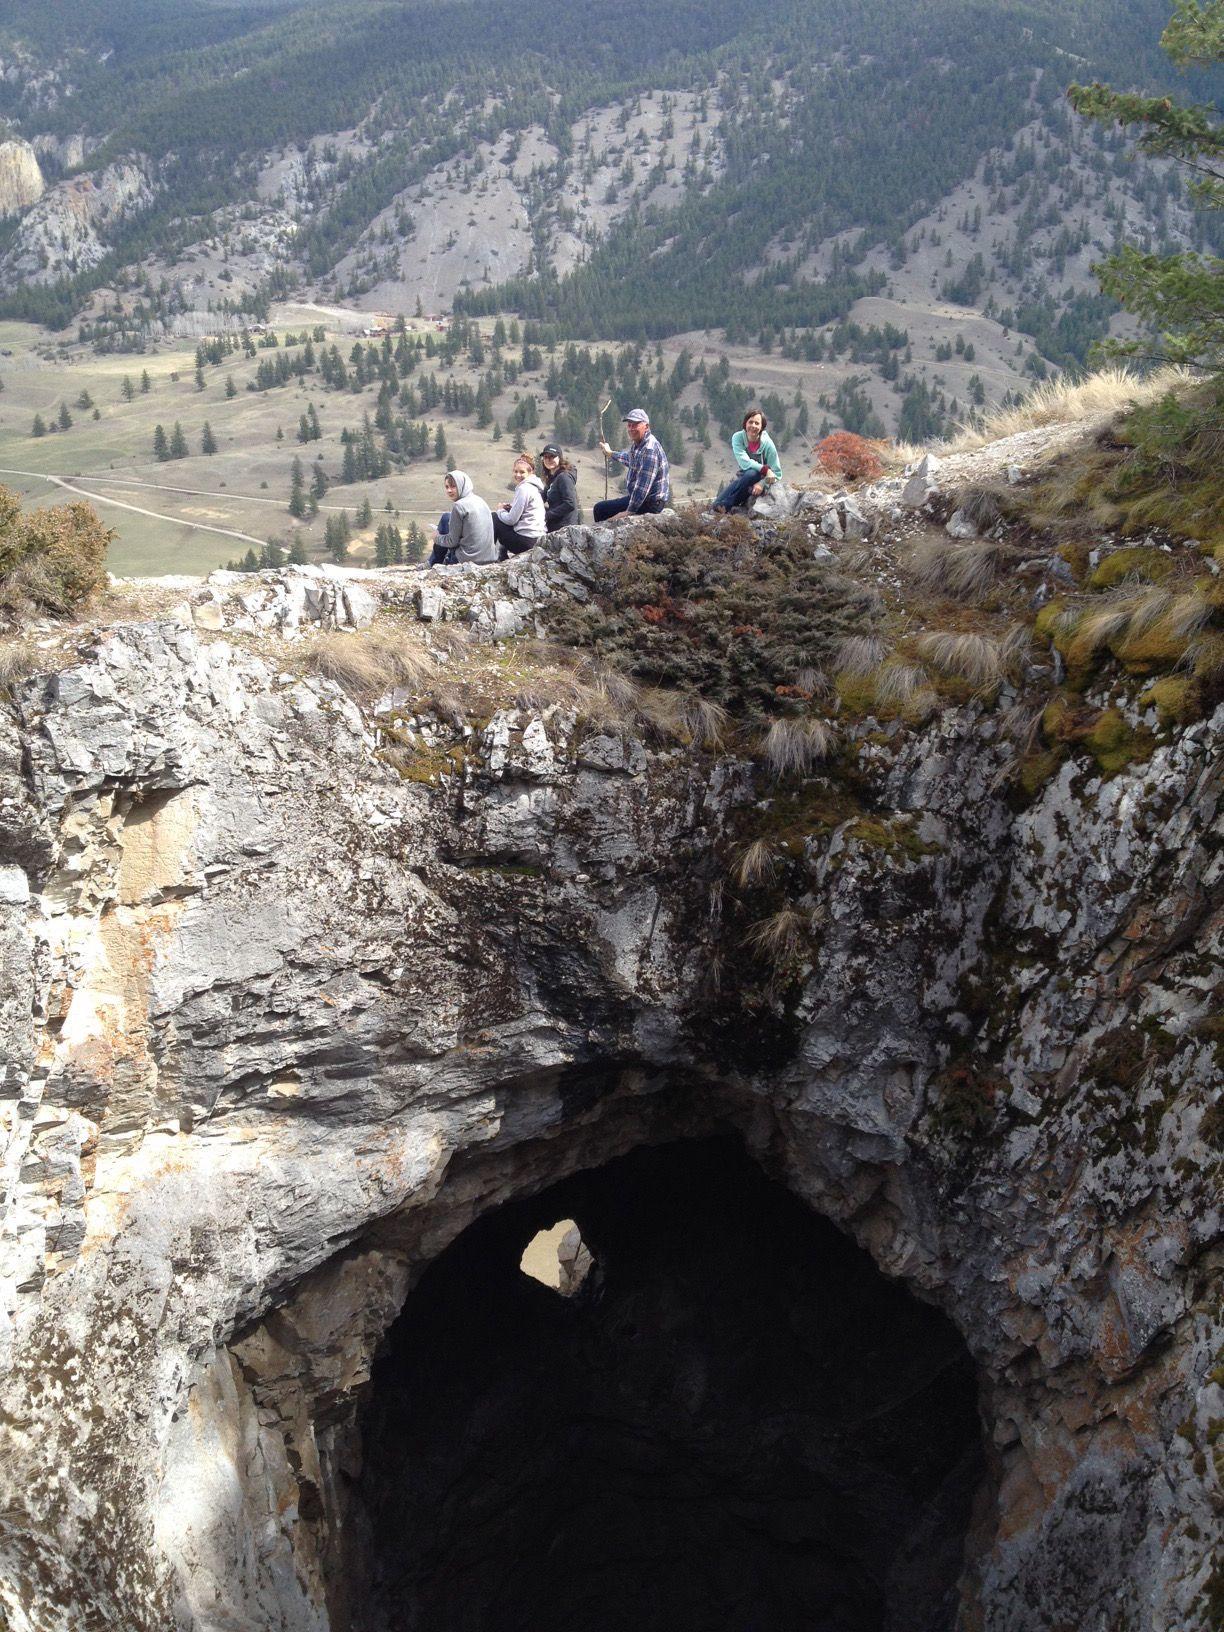 Man Cave Barber Williams Lake : Doc english bluff hike near williams lake british columbia